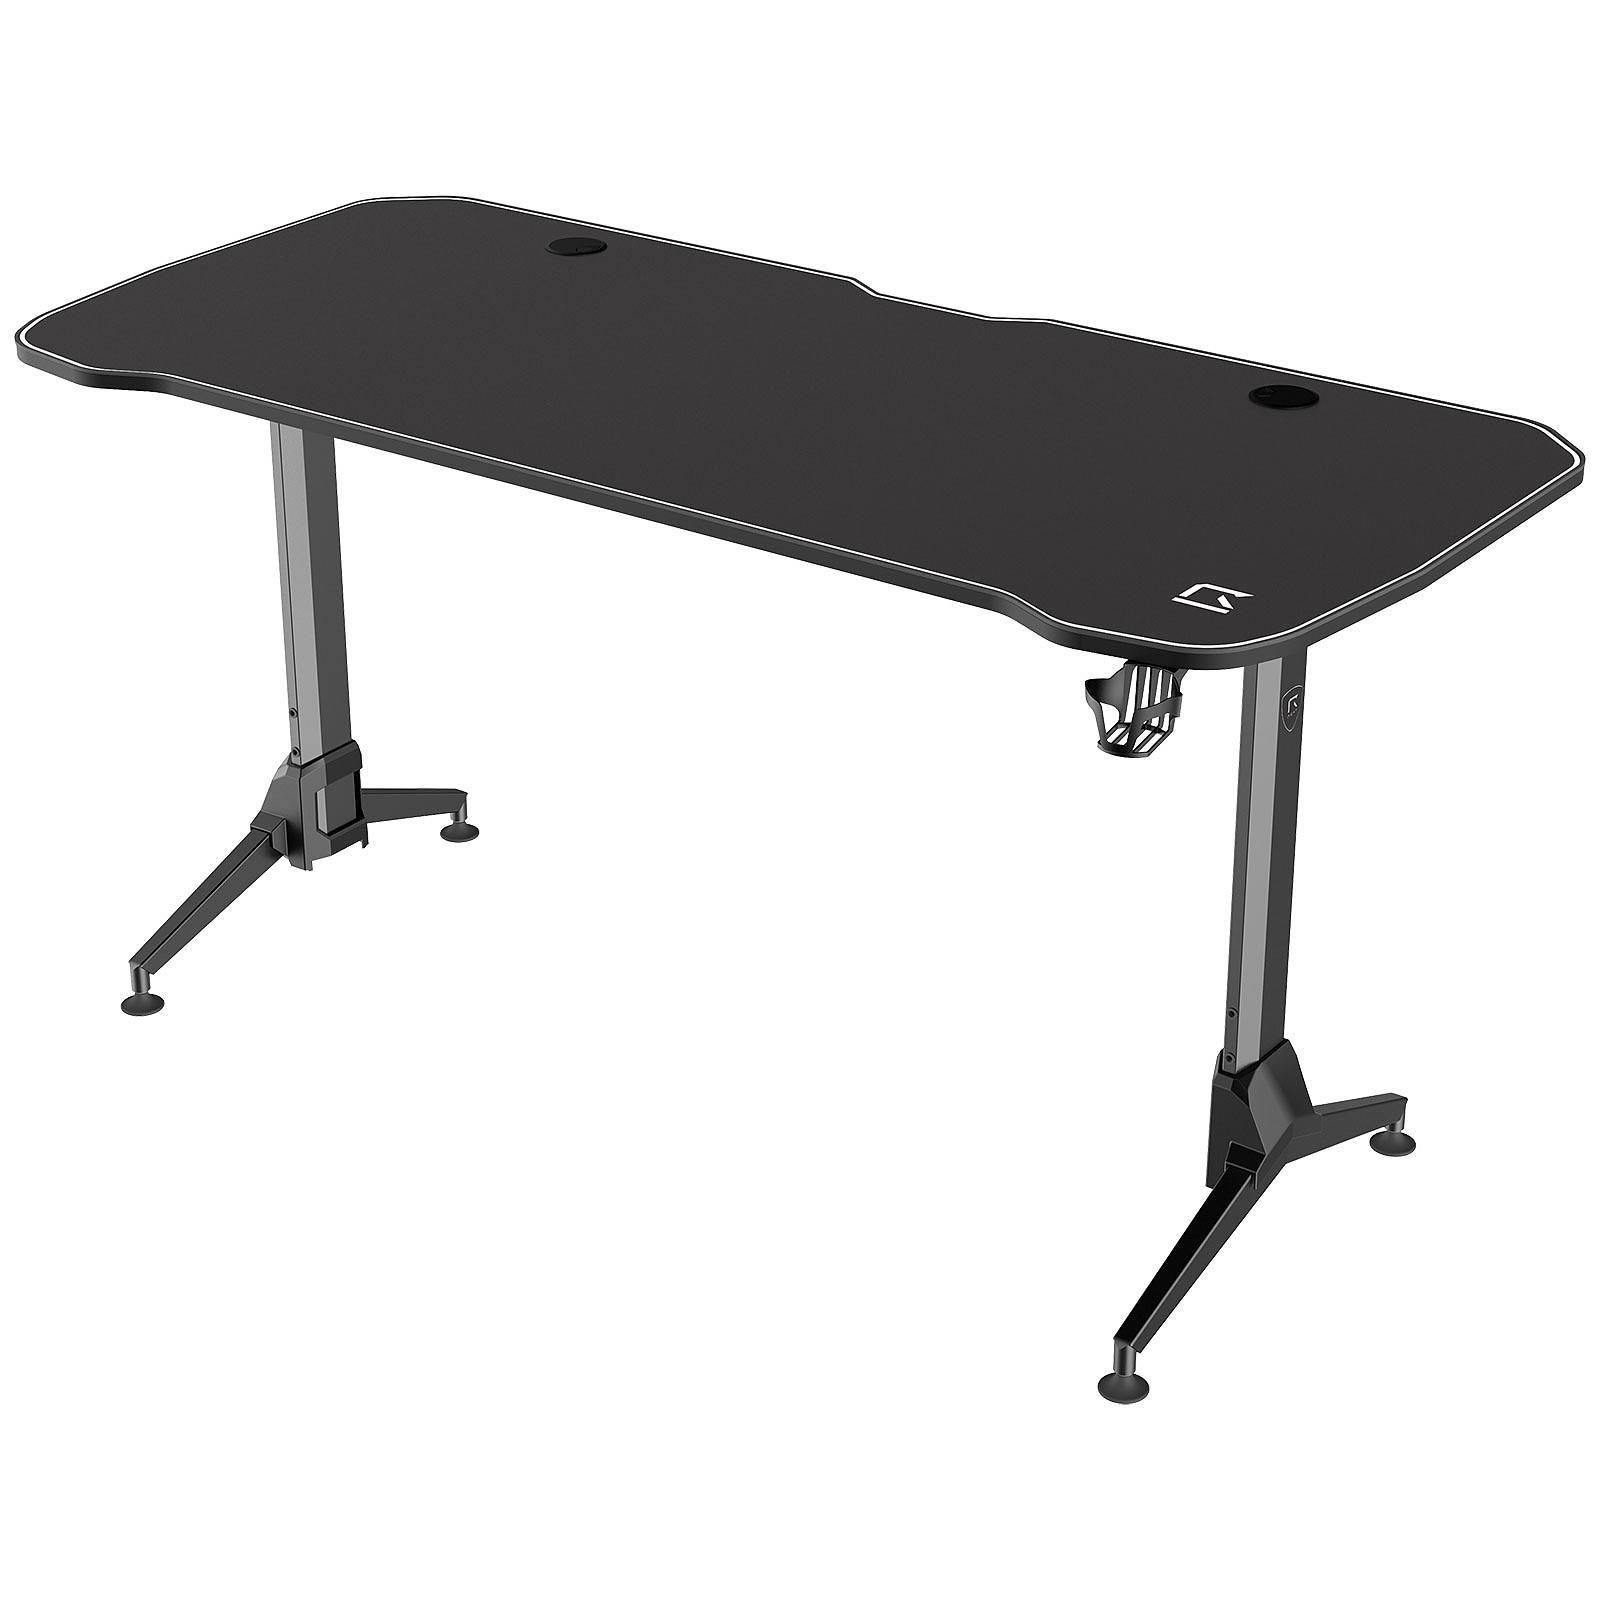 REKT R-Desk Max 160